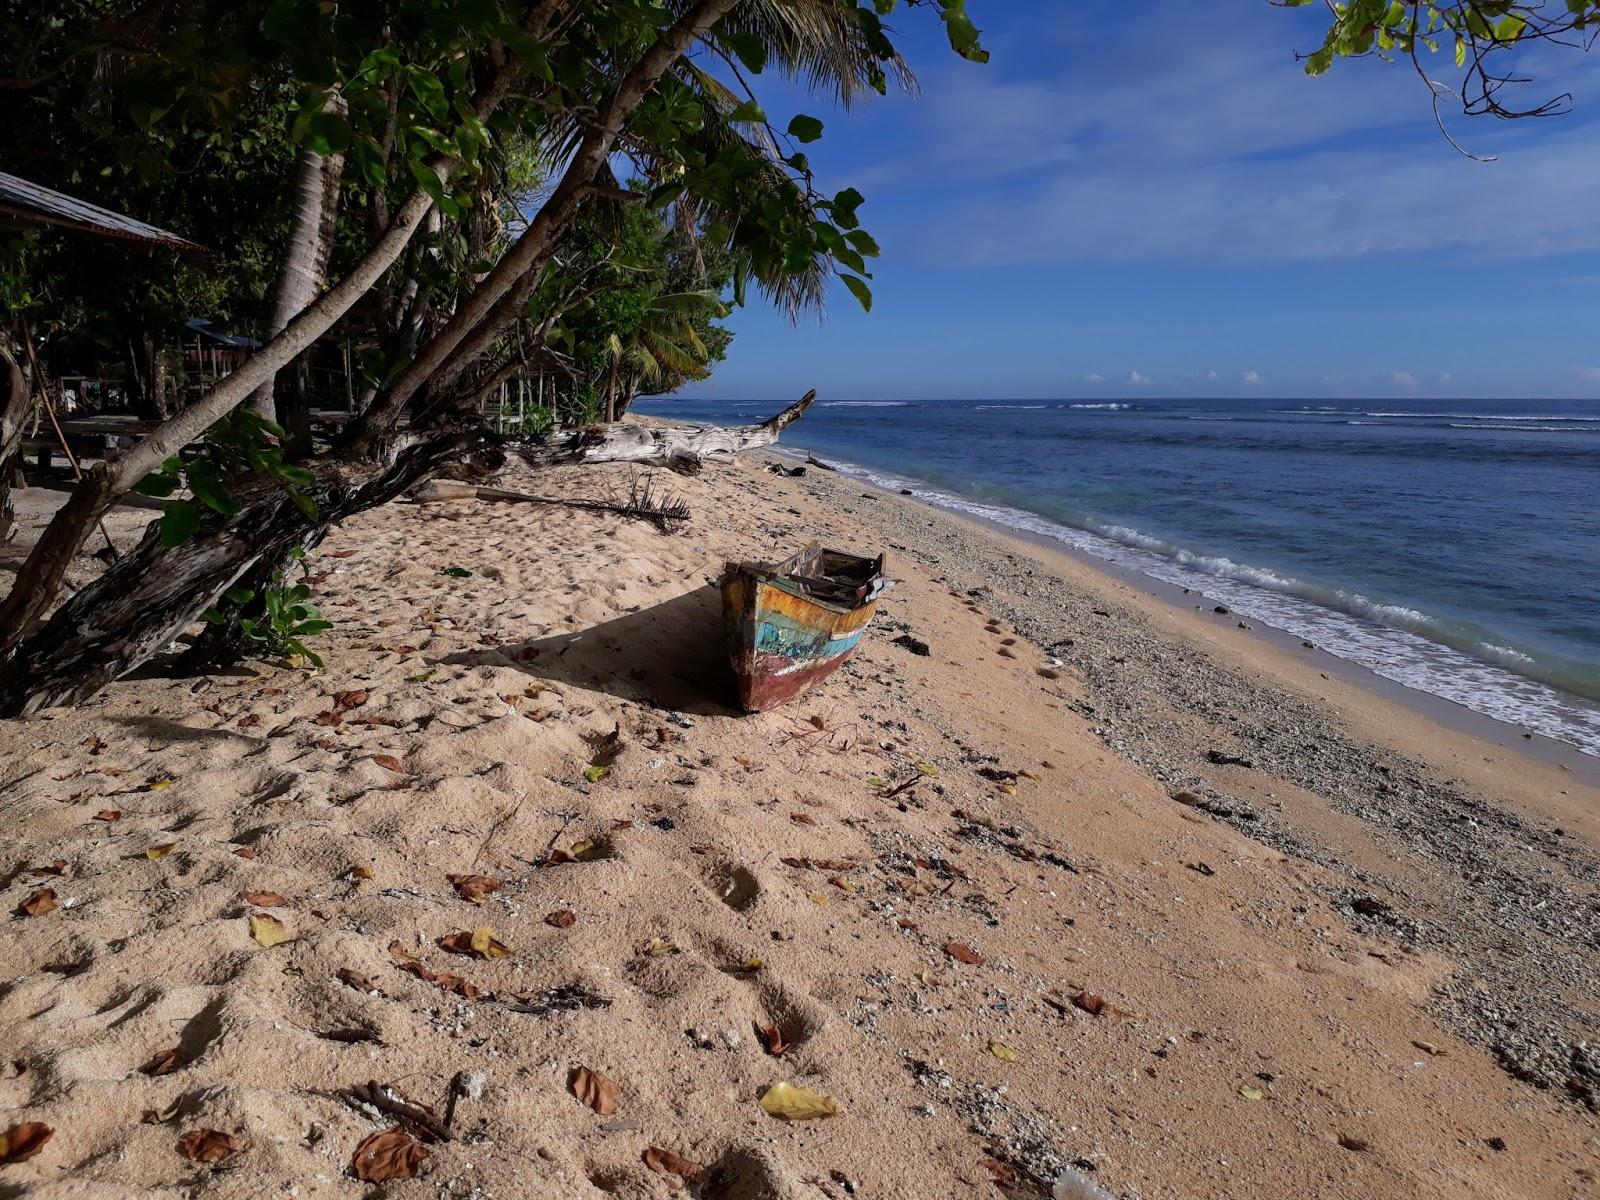 Blog Kang Dana 2017 Memanjakan Tubuh Disentuhnya Langitpun Bersih Bersahabat